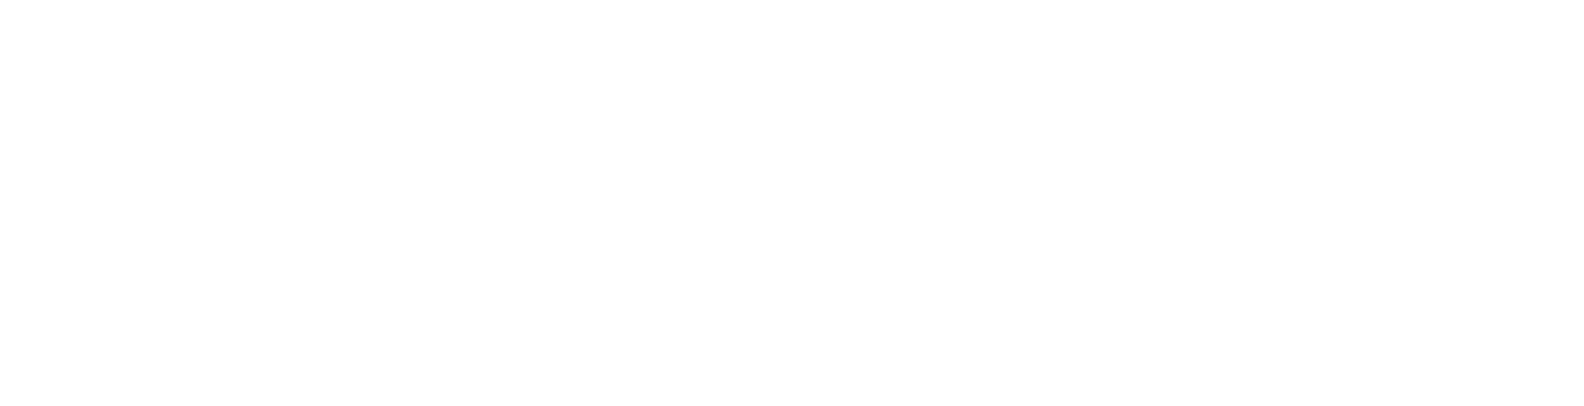 Montani Tesei